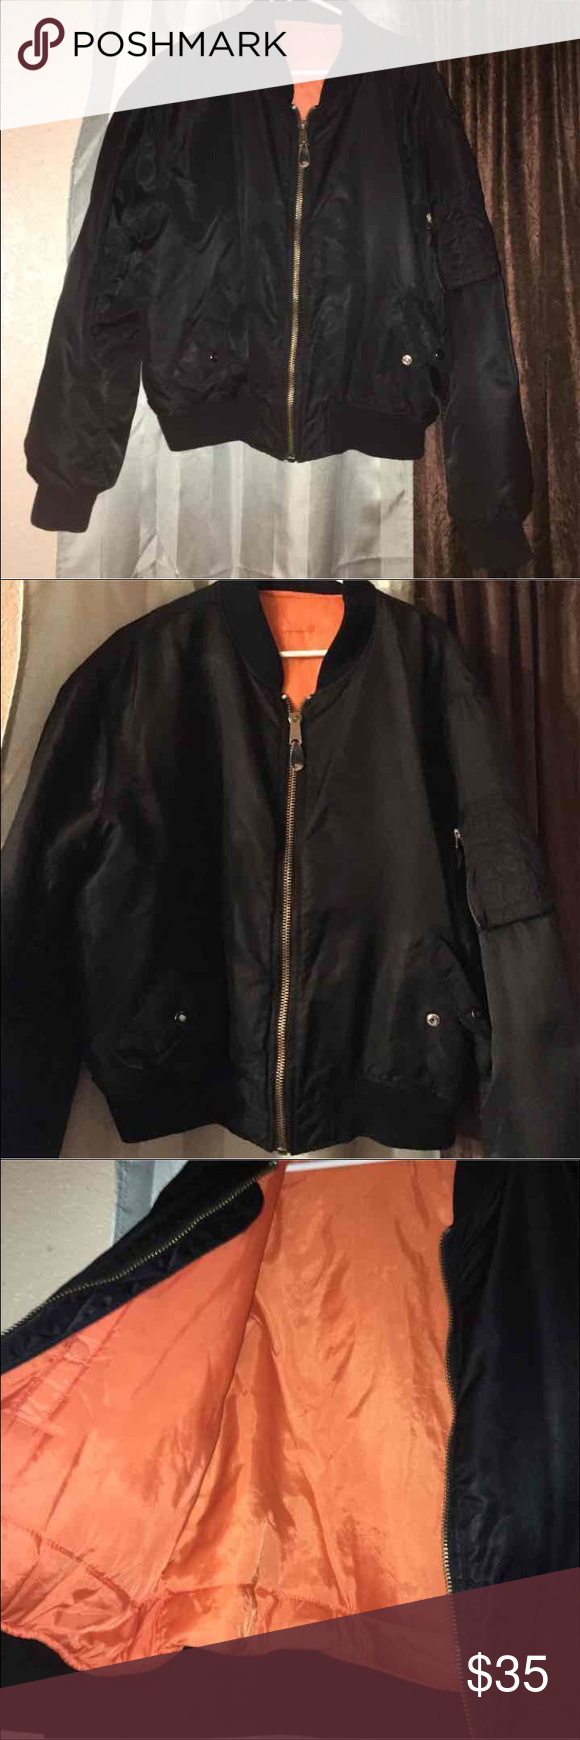 Bomber jacket men Great condition oversizede,fast shipping Jackets & Coats Bomber & Varsity